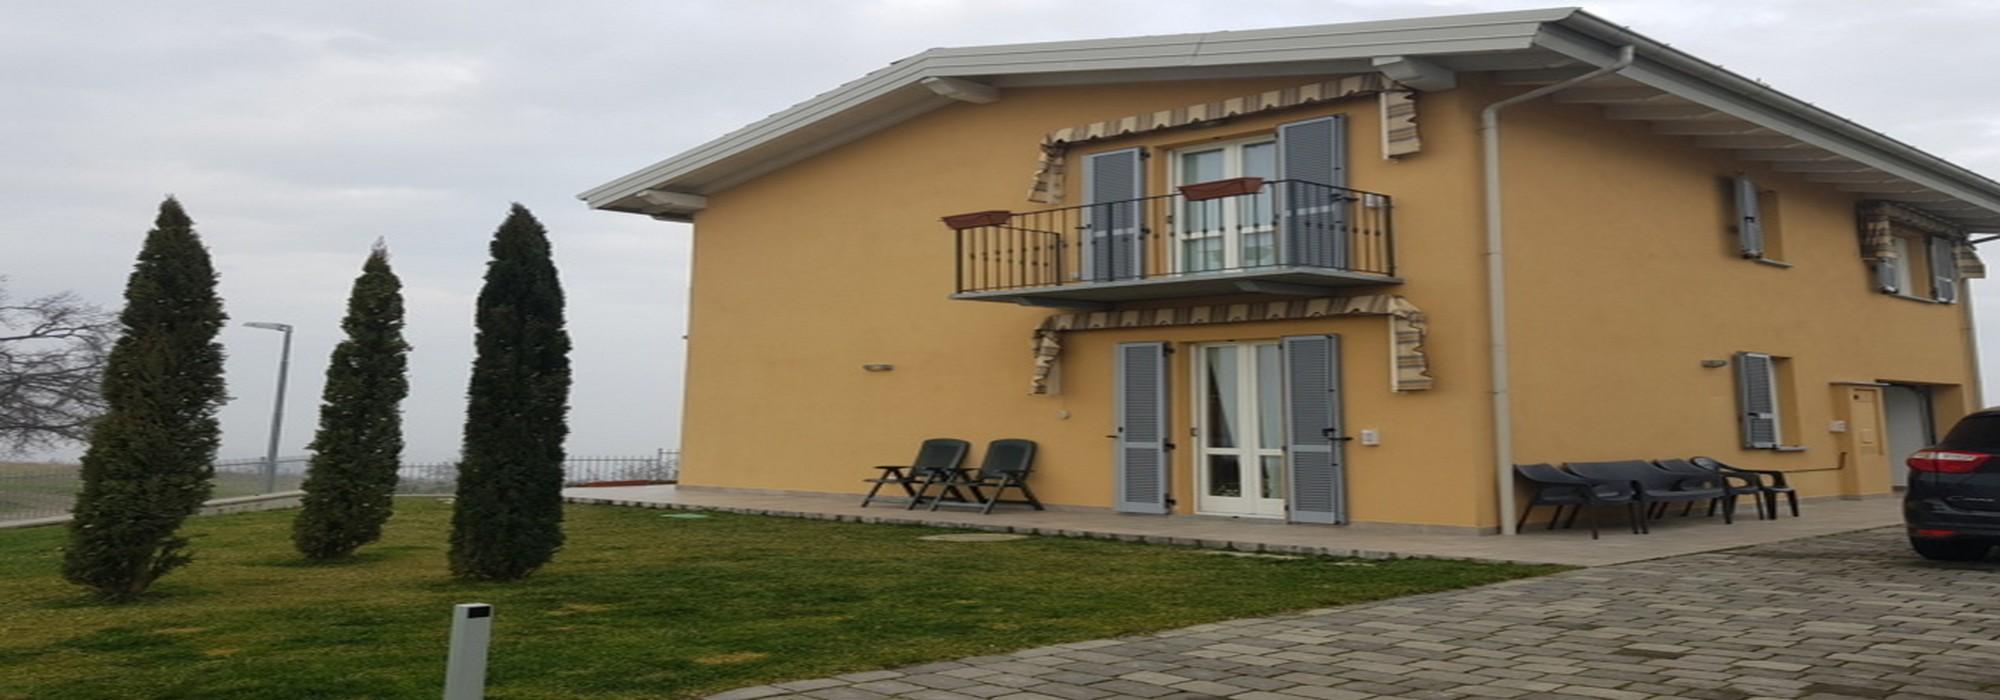 Montu' Beccaria (PV) VENDITA Villa con vista panoramica Rif. 616